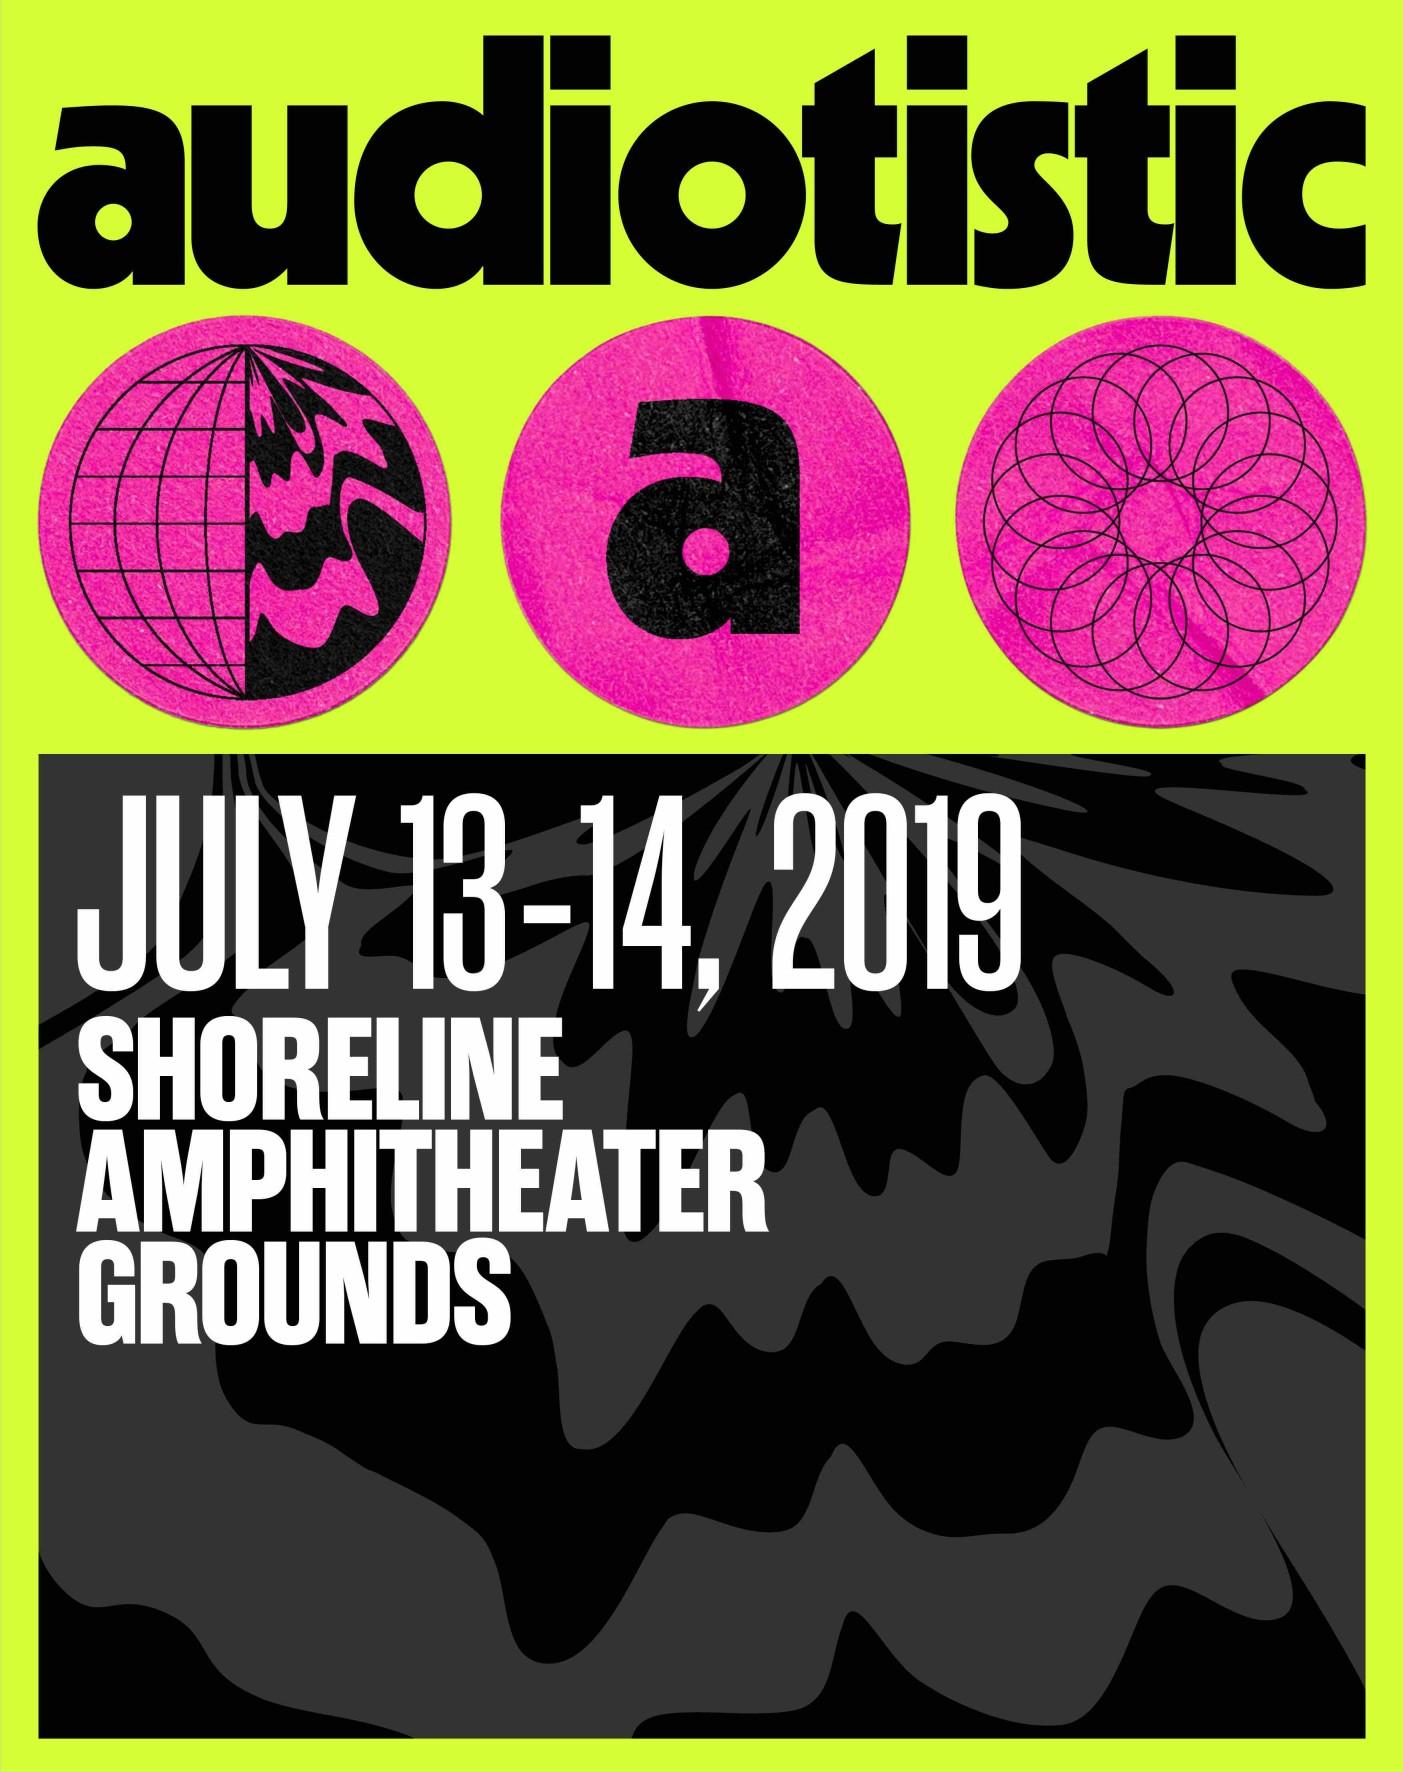 Audiotistic Bay Area - Locker Rental